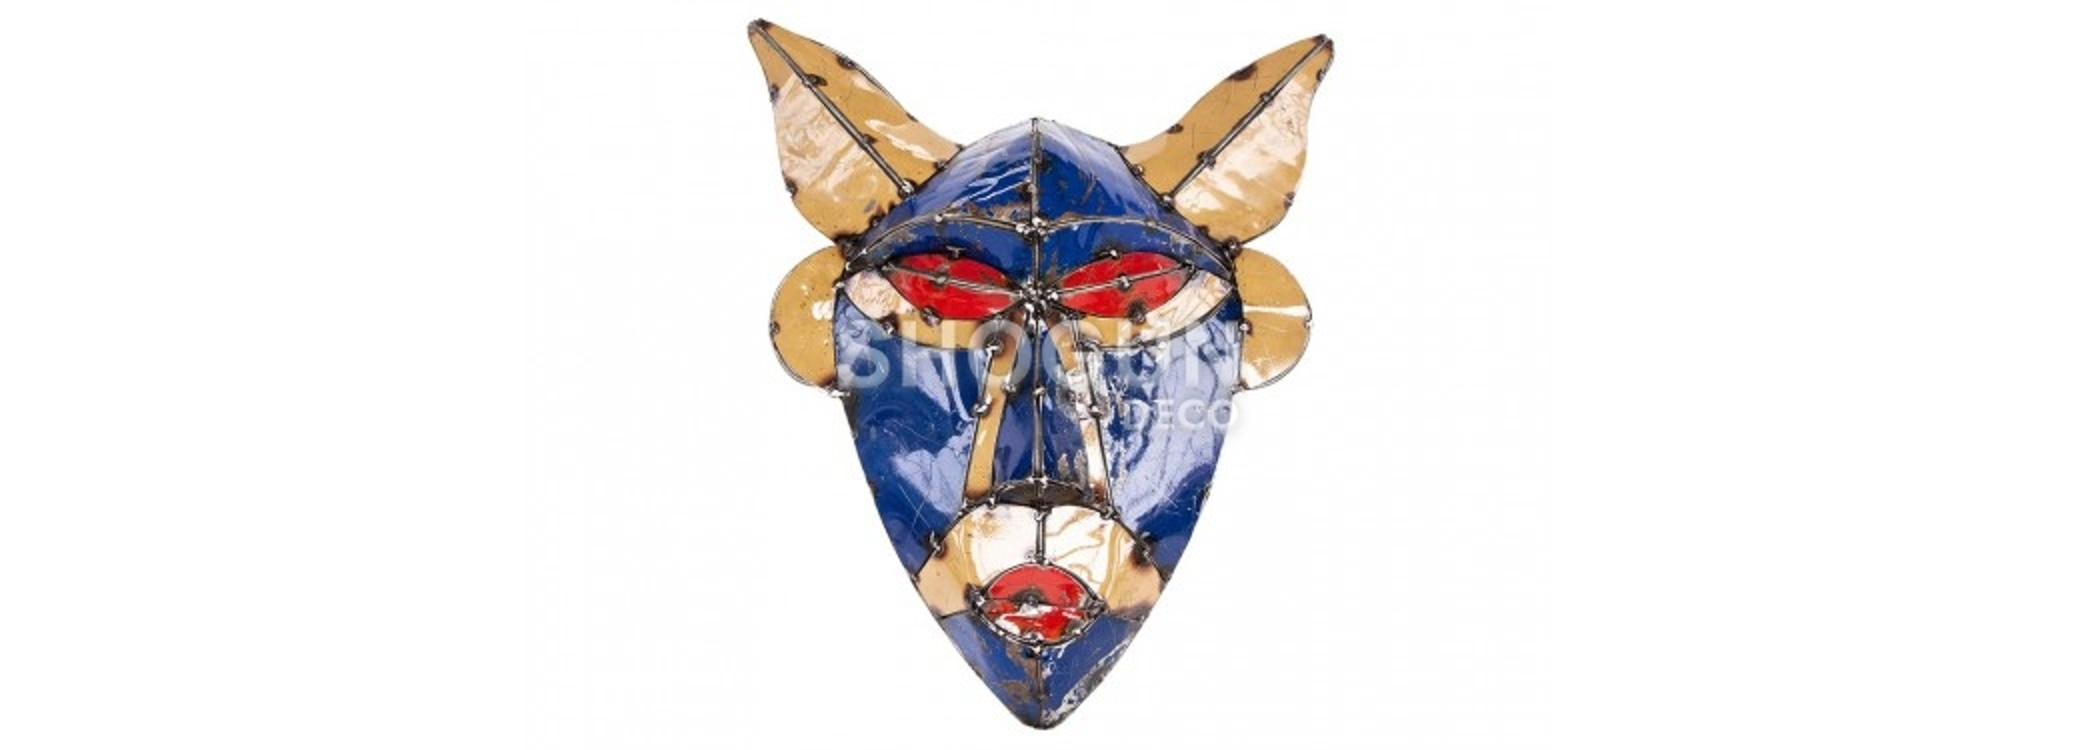 Masque mural en bidon recyclé - petit format